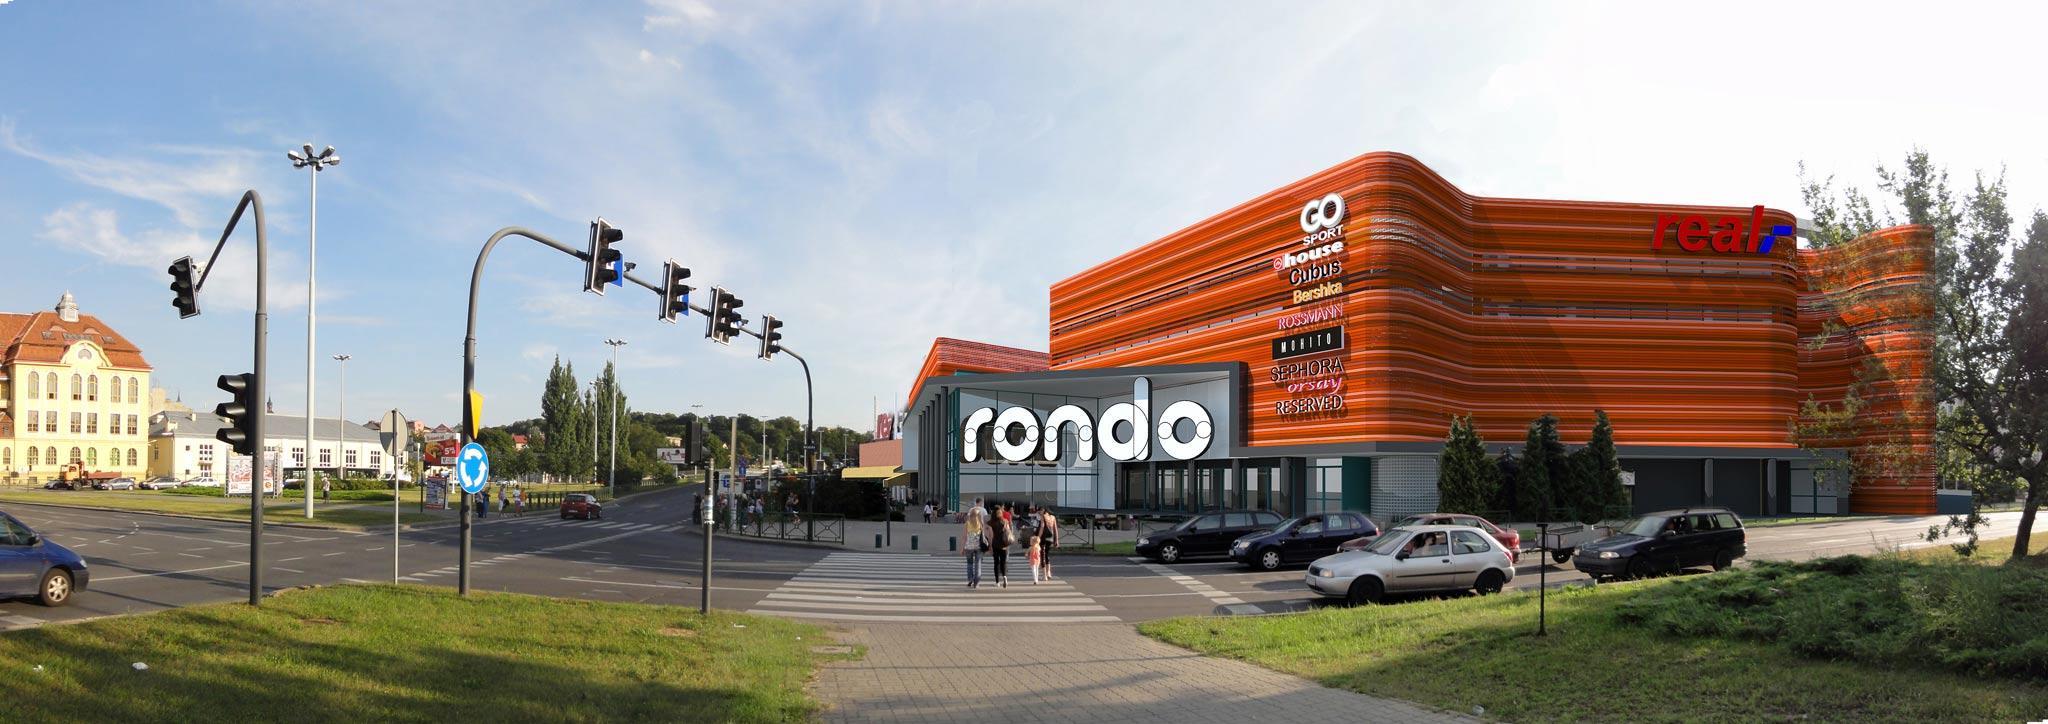 rondo-11